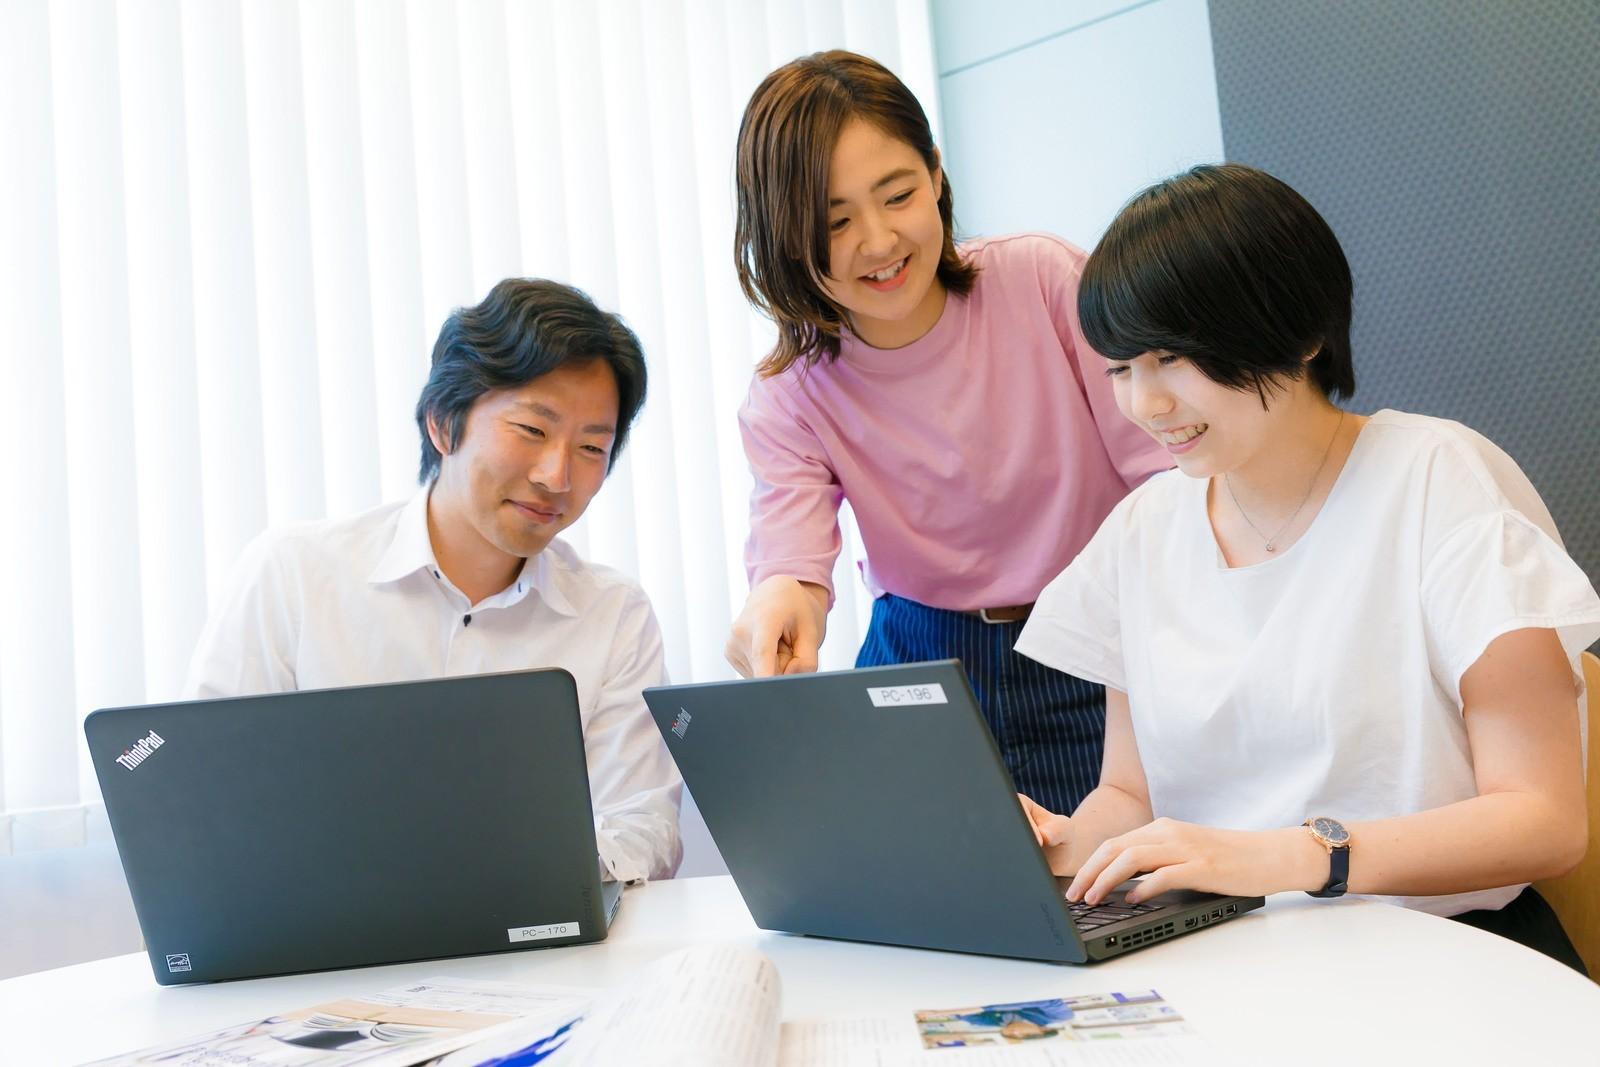 IT×人材◎就職支援事業を展開するオンリーワンカンパニー【社内SE募集!】